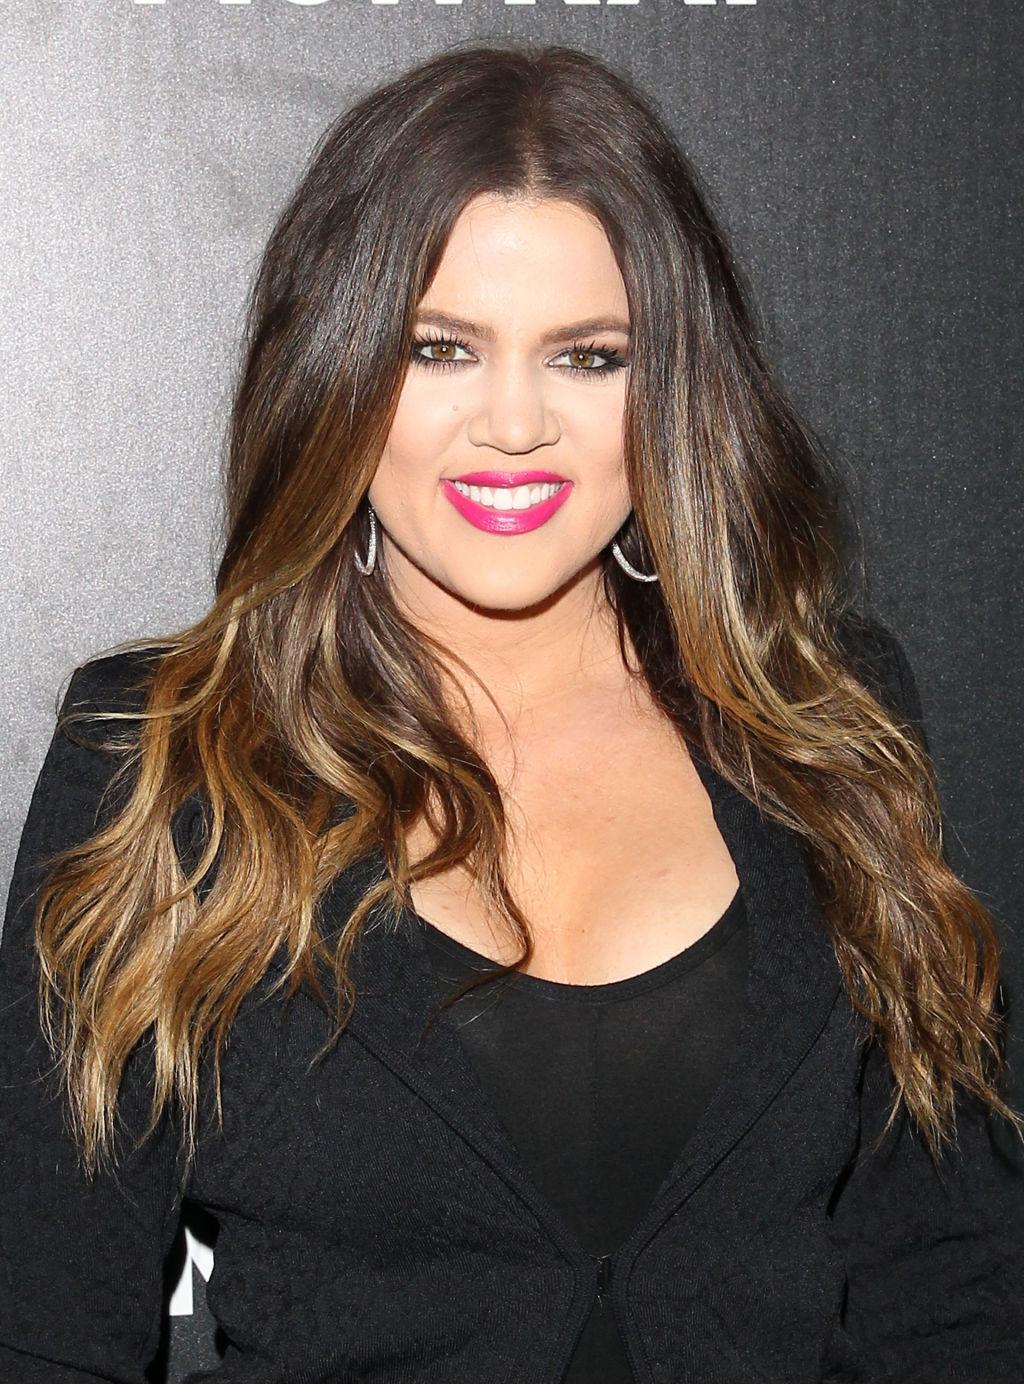 Khloe Kardashian Interview Khloe Kardashian Infertility